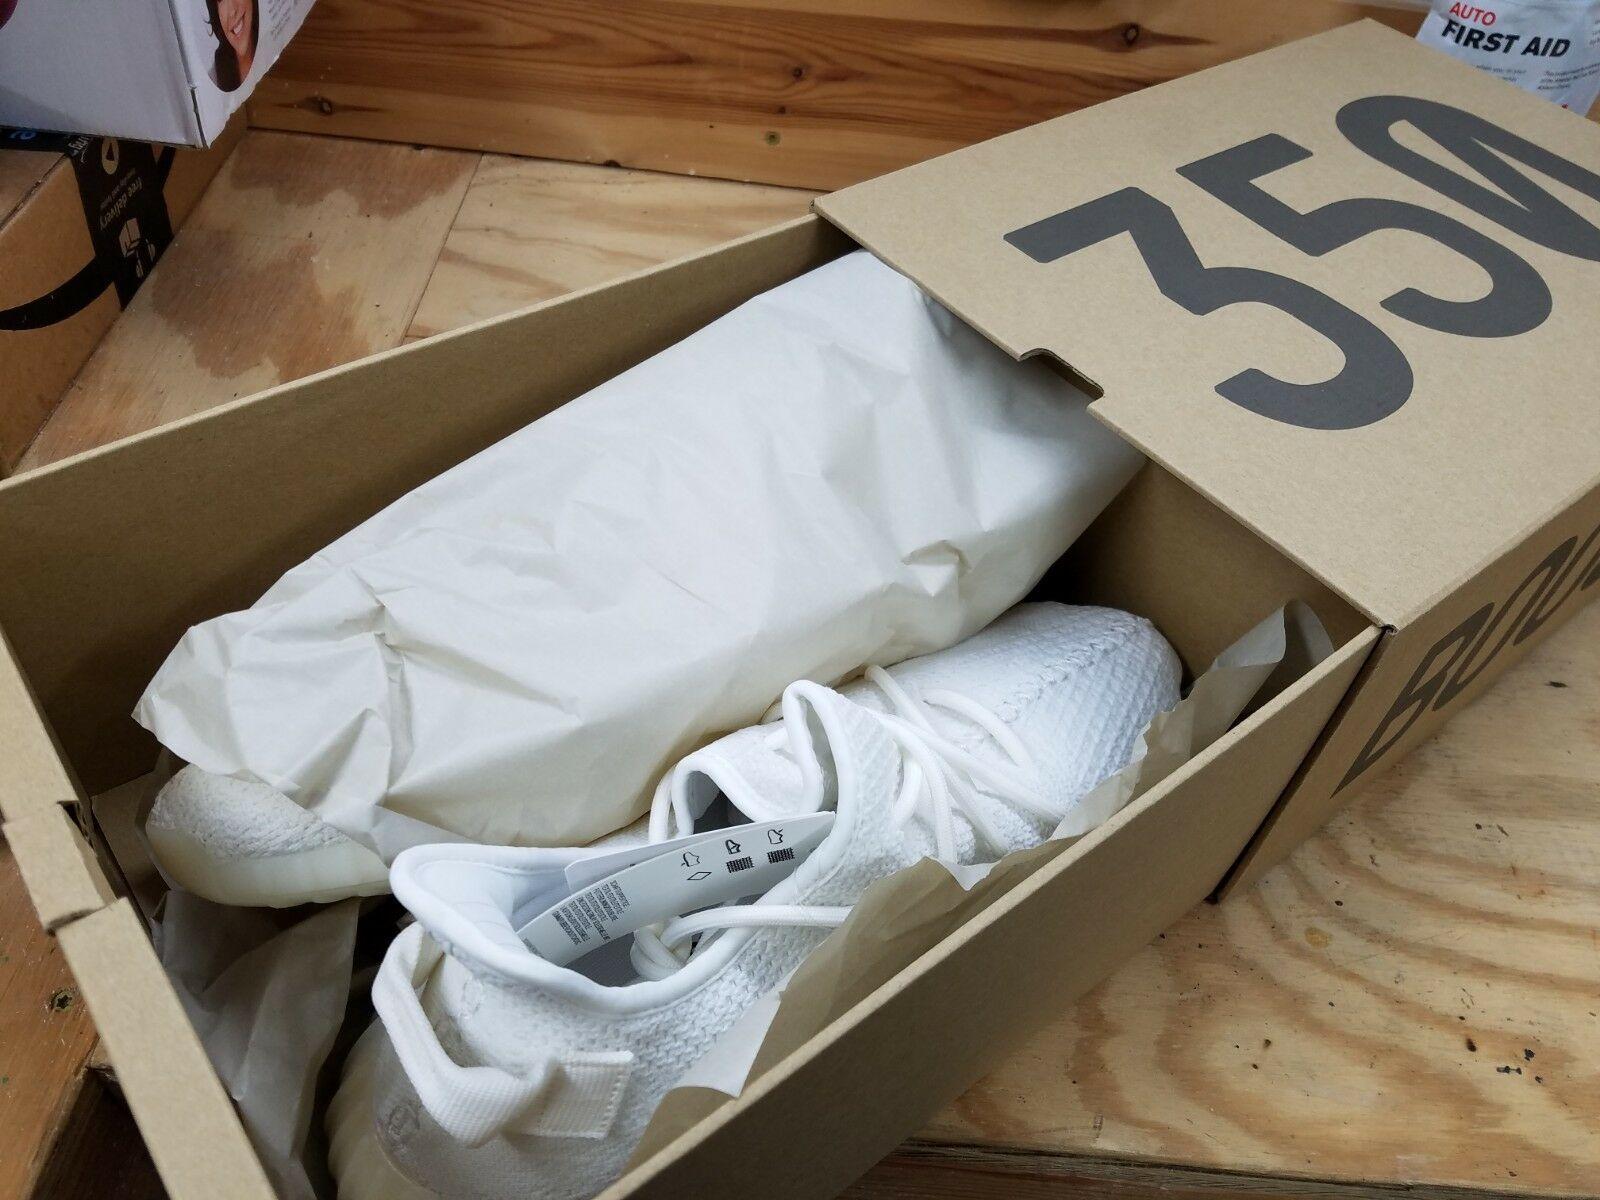 c2b055bba Adidas Yeezy Boost 350 V2 - Triple White (CP9366) - SIZE 12